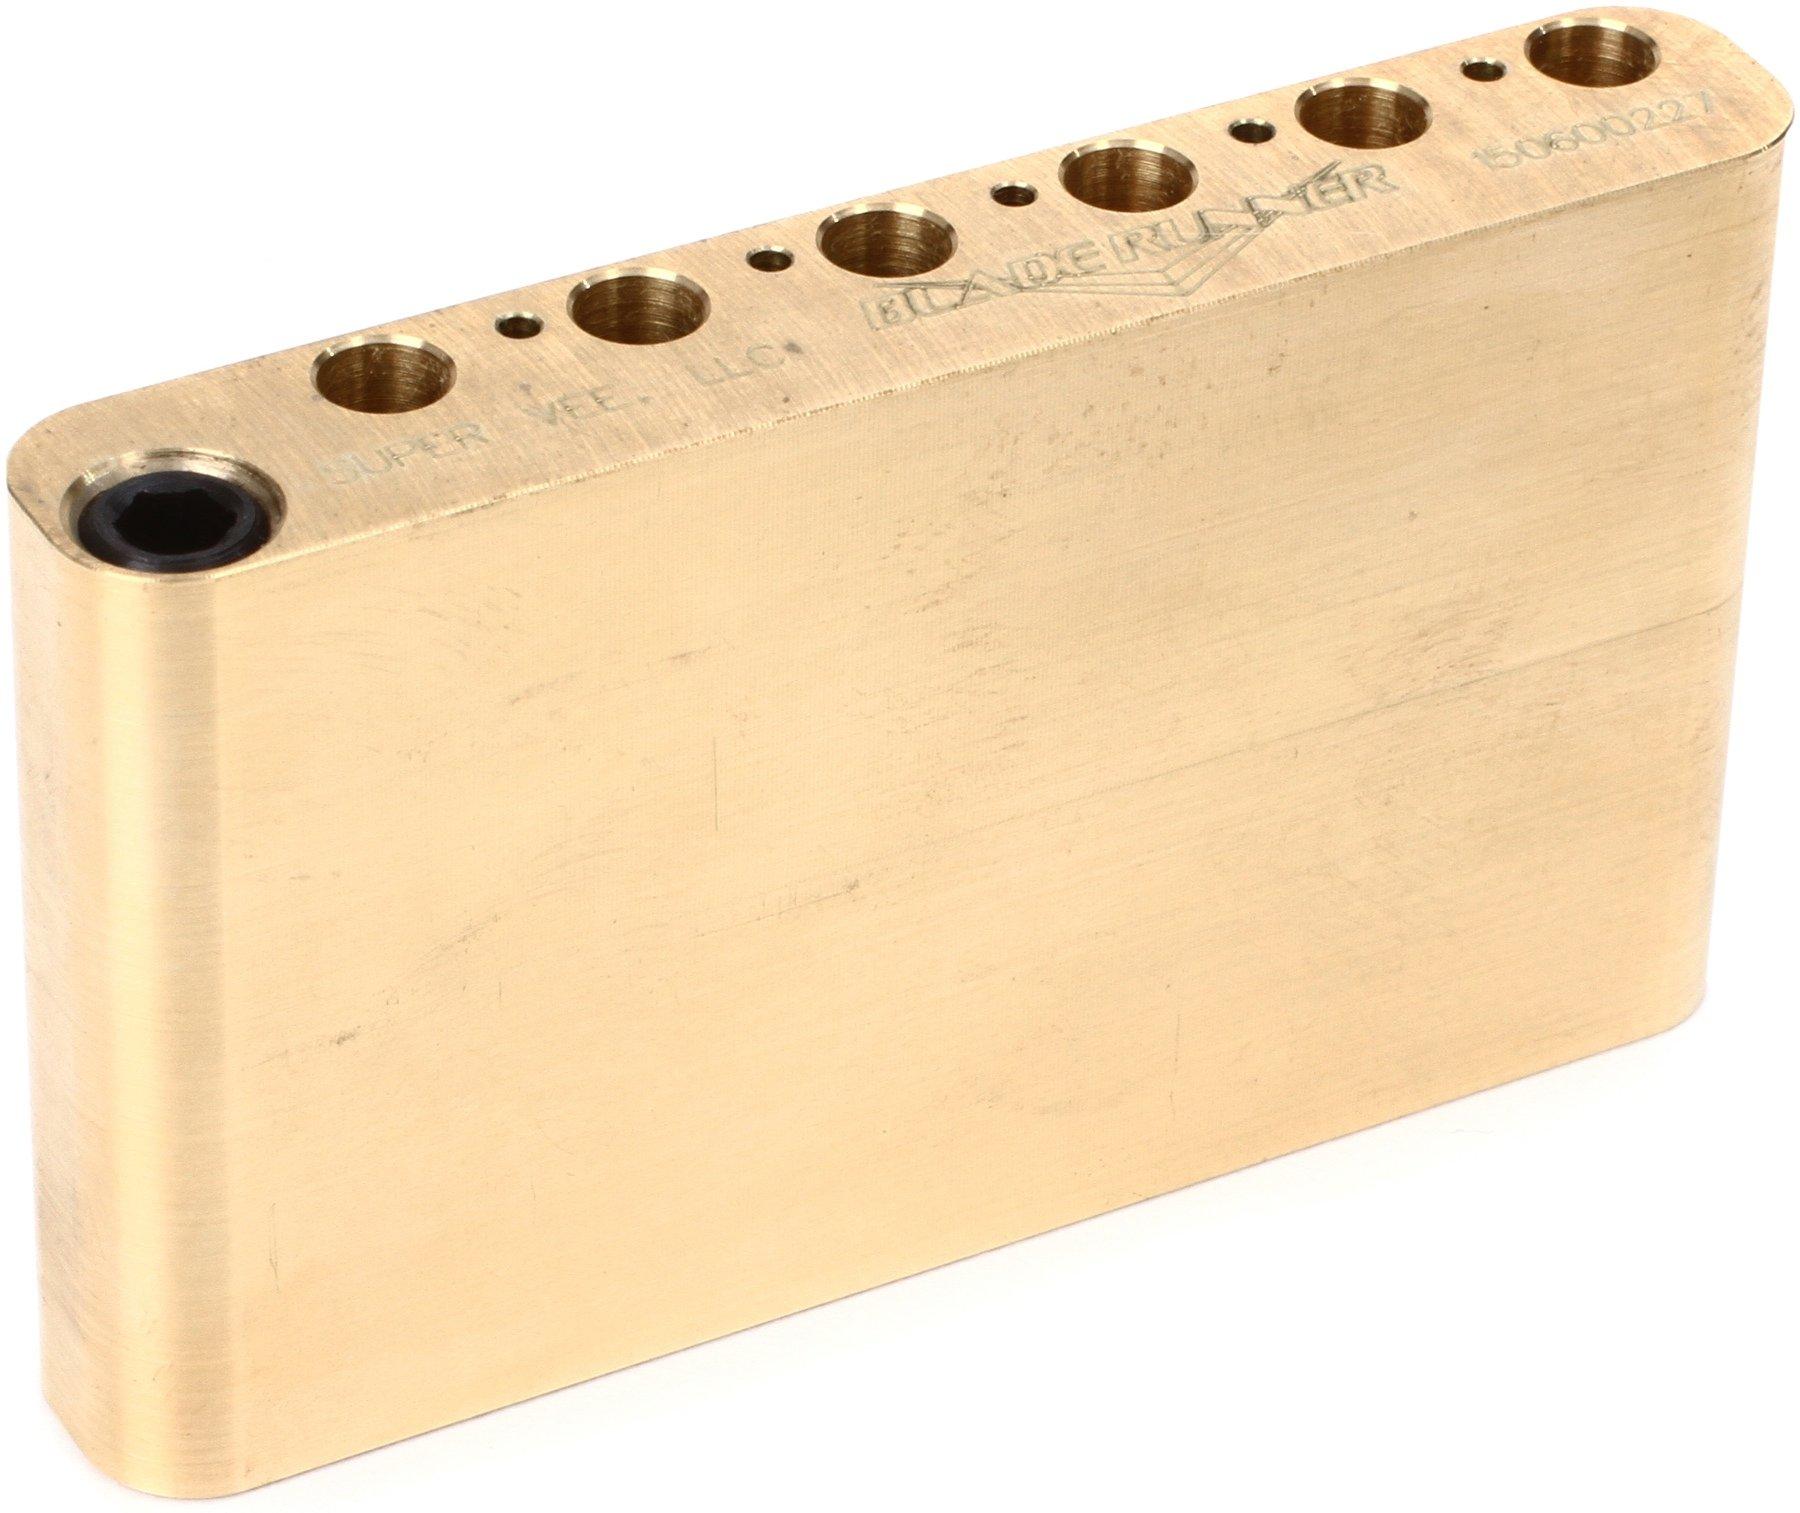 Super-Vee Sustain Tone Block - Brass